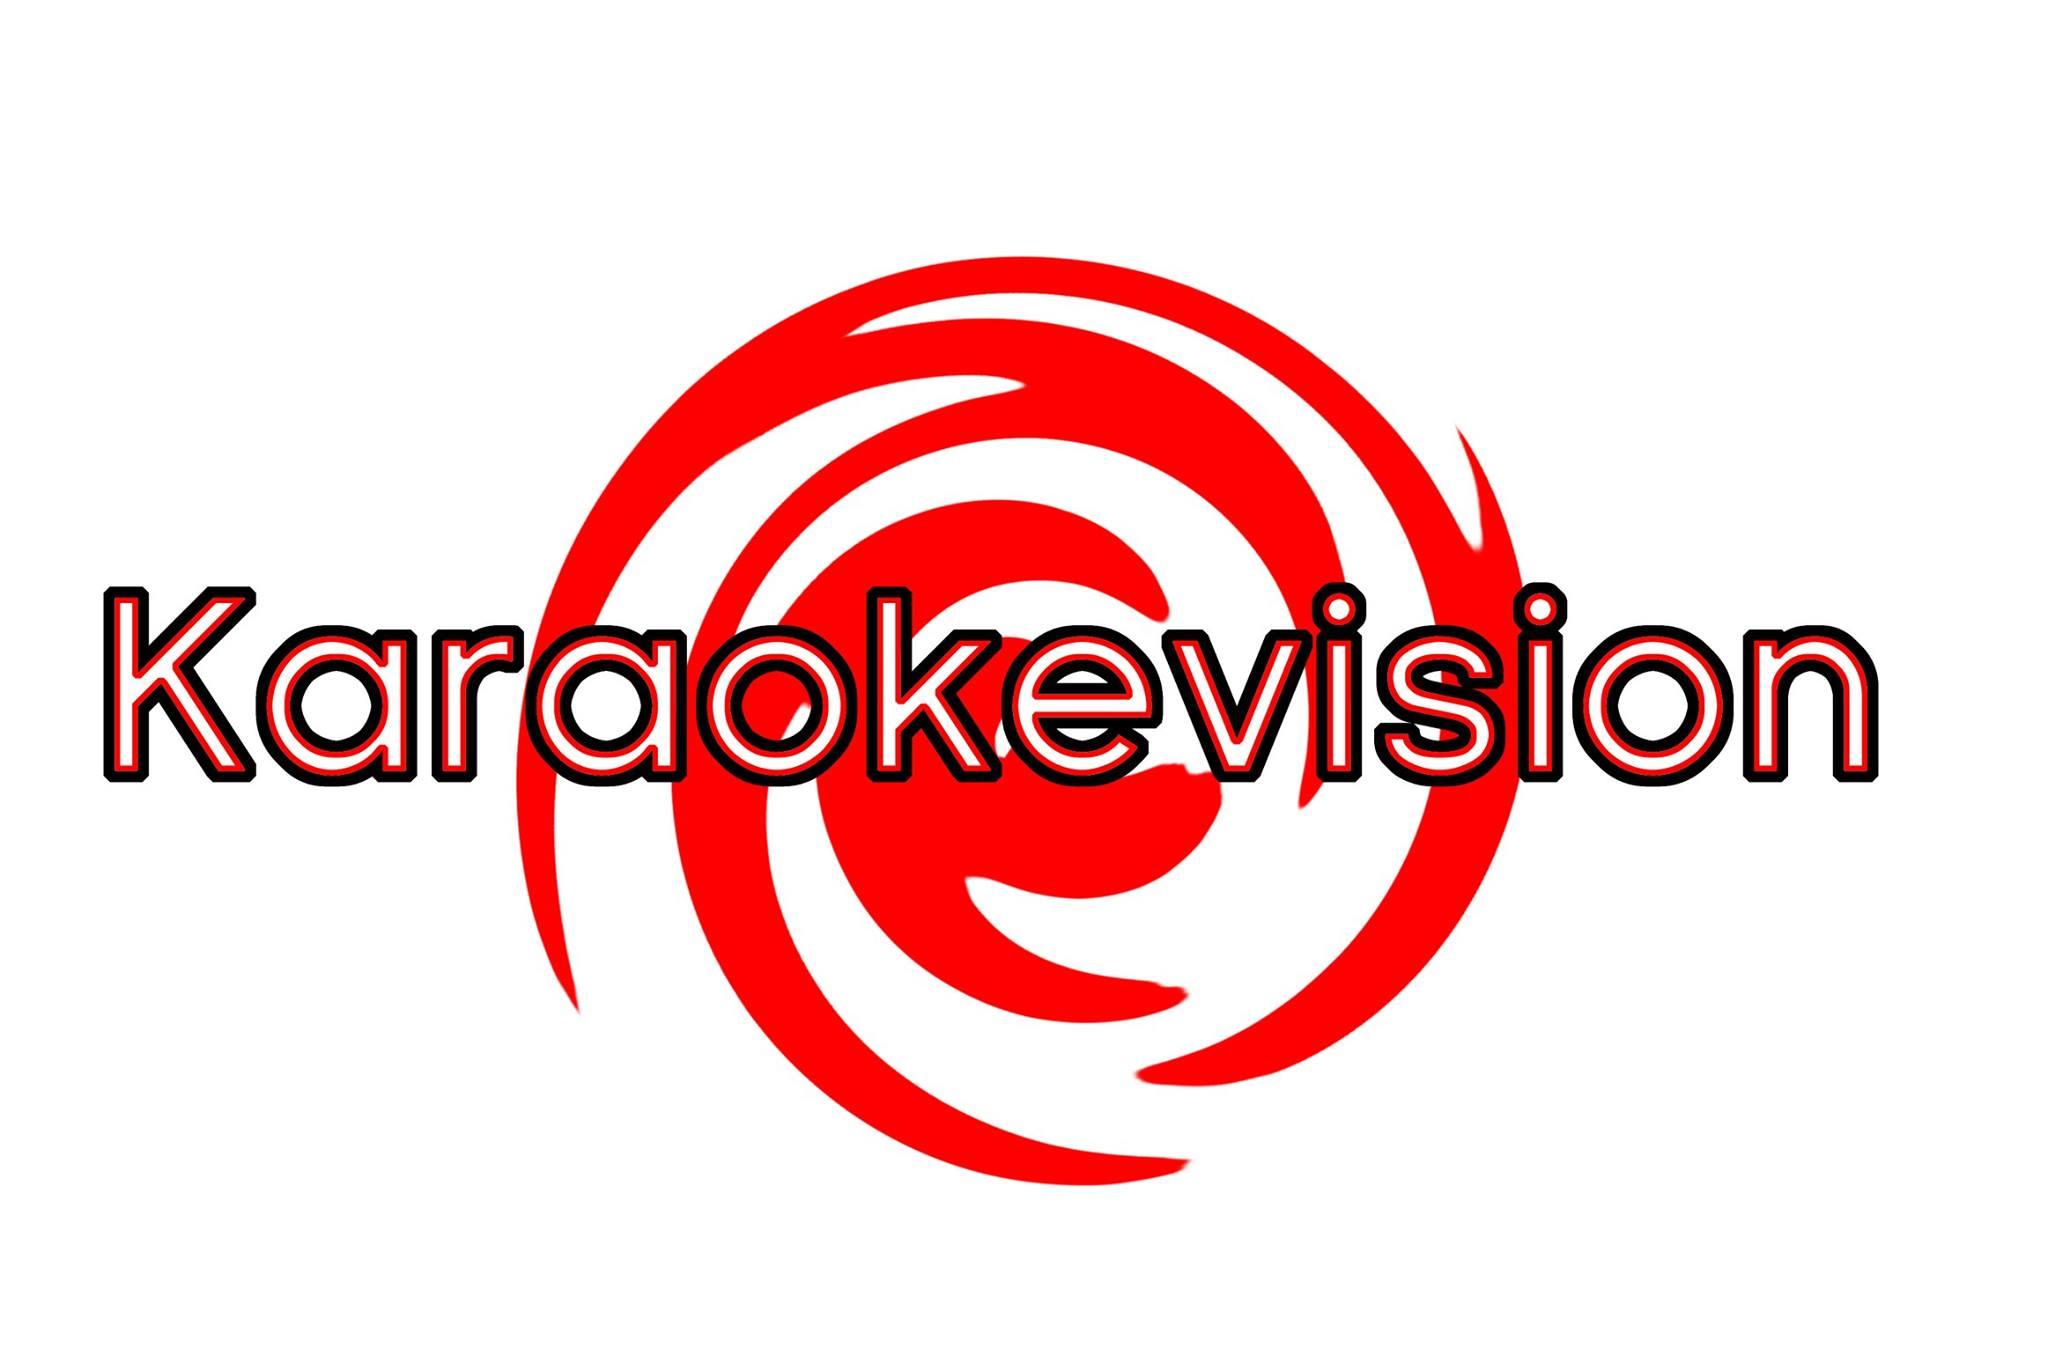 karaokevision